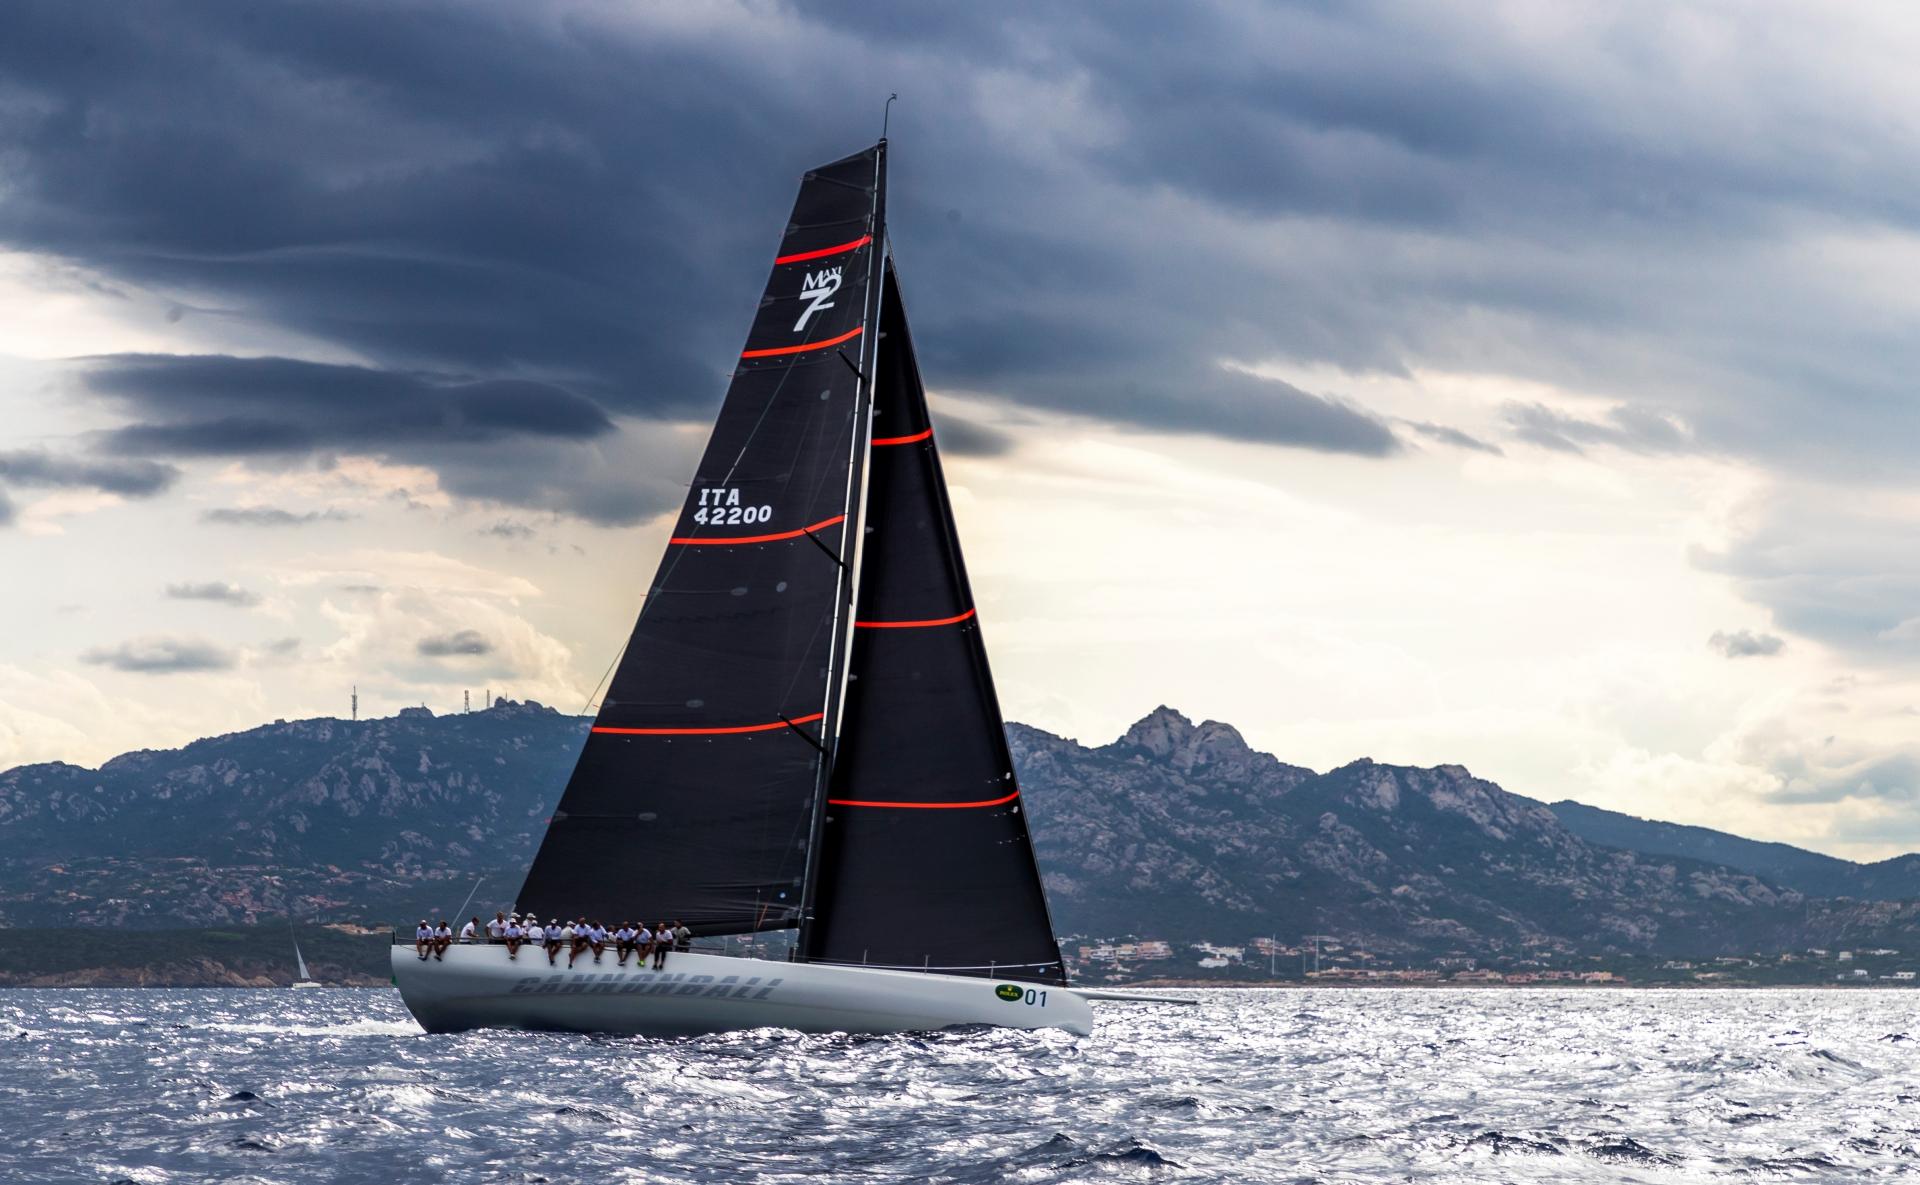 Maxi Yacht Rolex Cup: Racing cancelled today in Porto Cervo - NEWS - Yacht Club Costa Smeralda